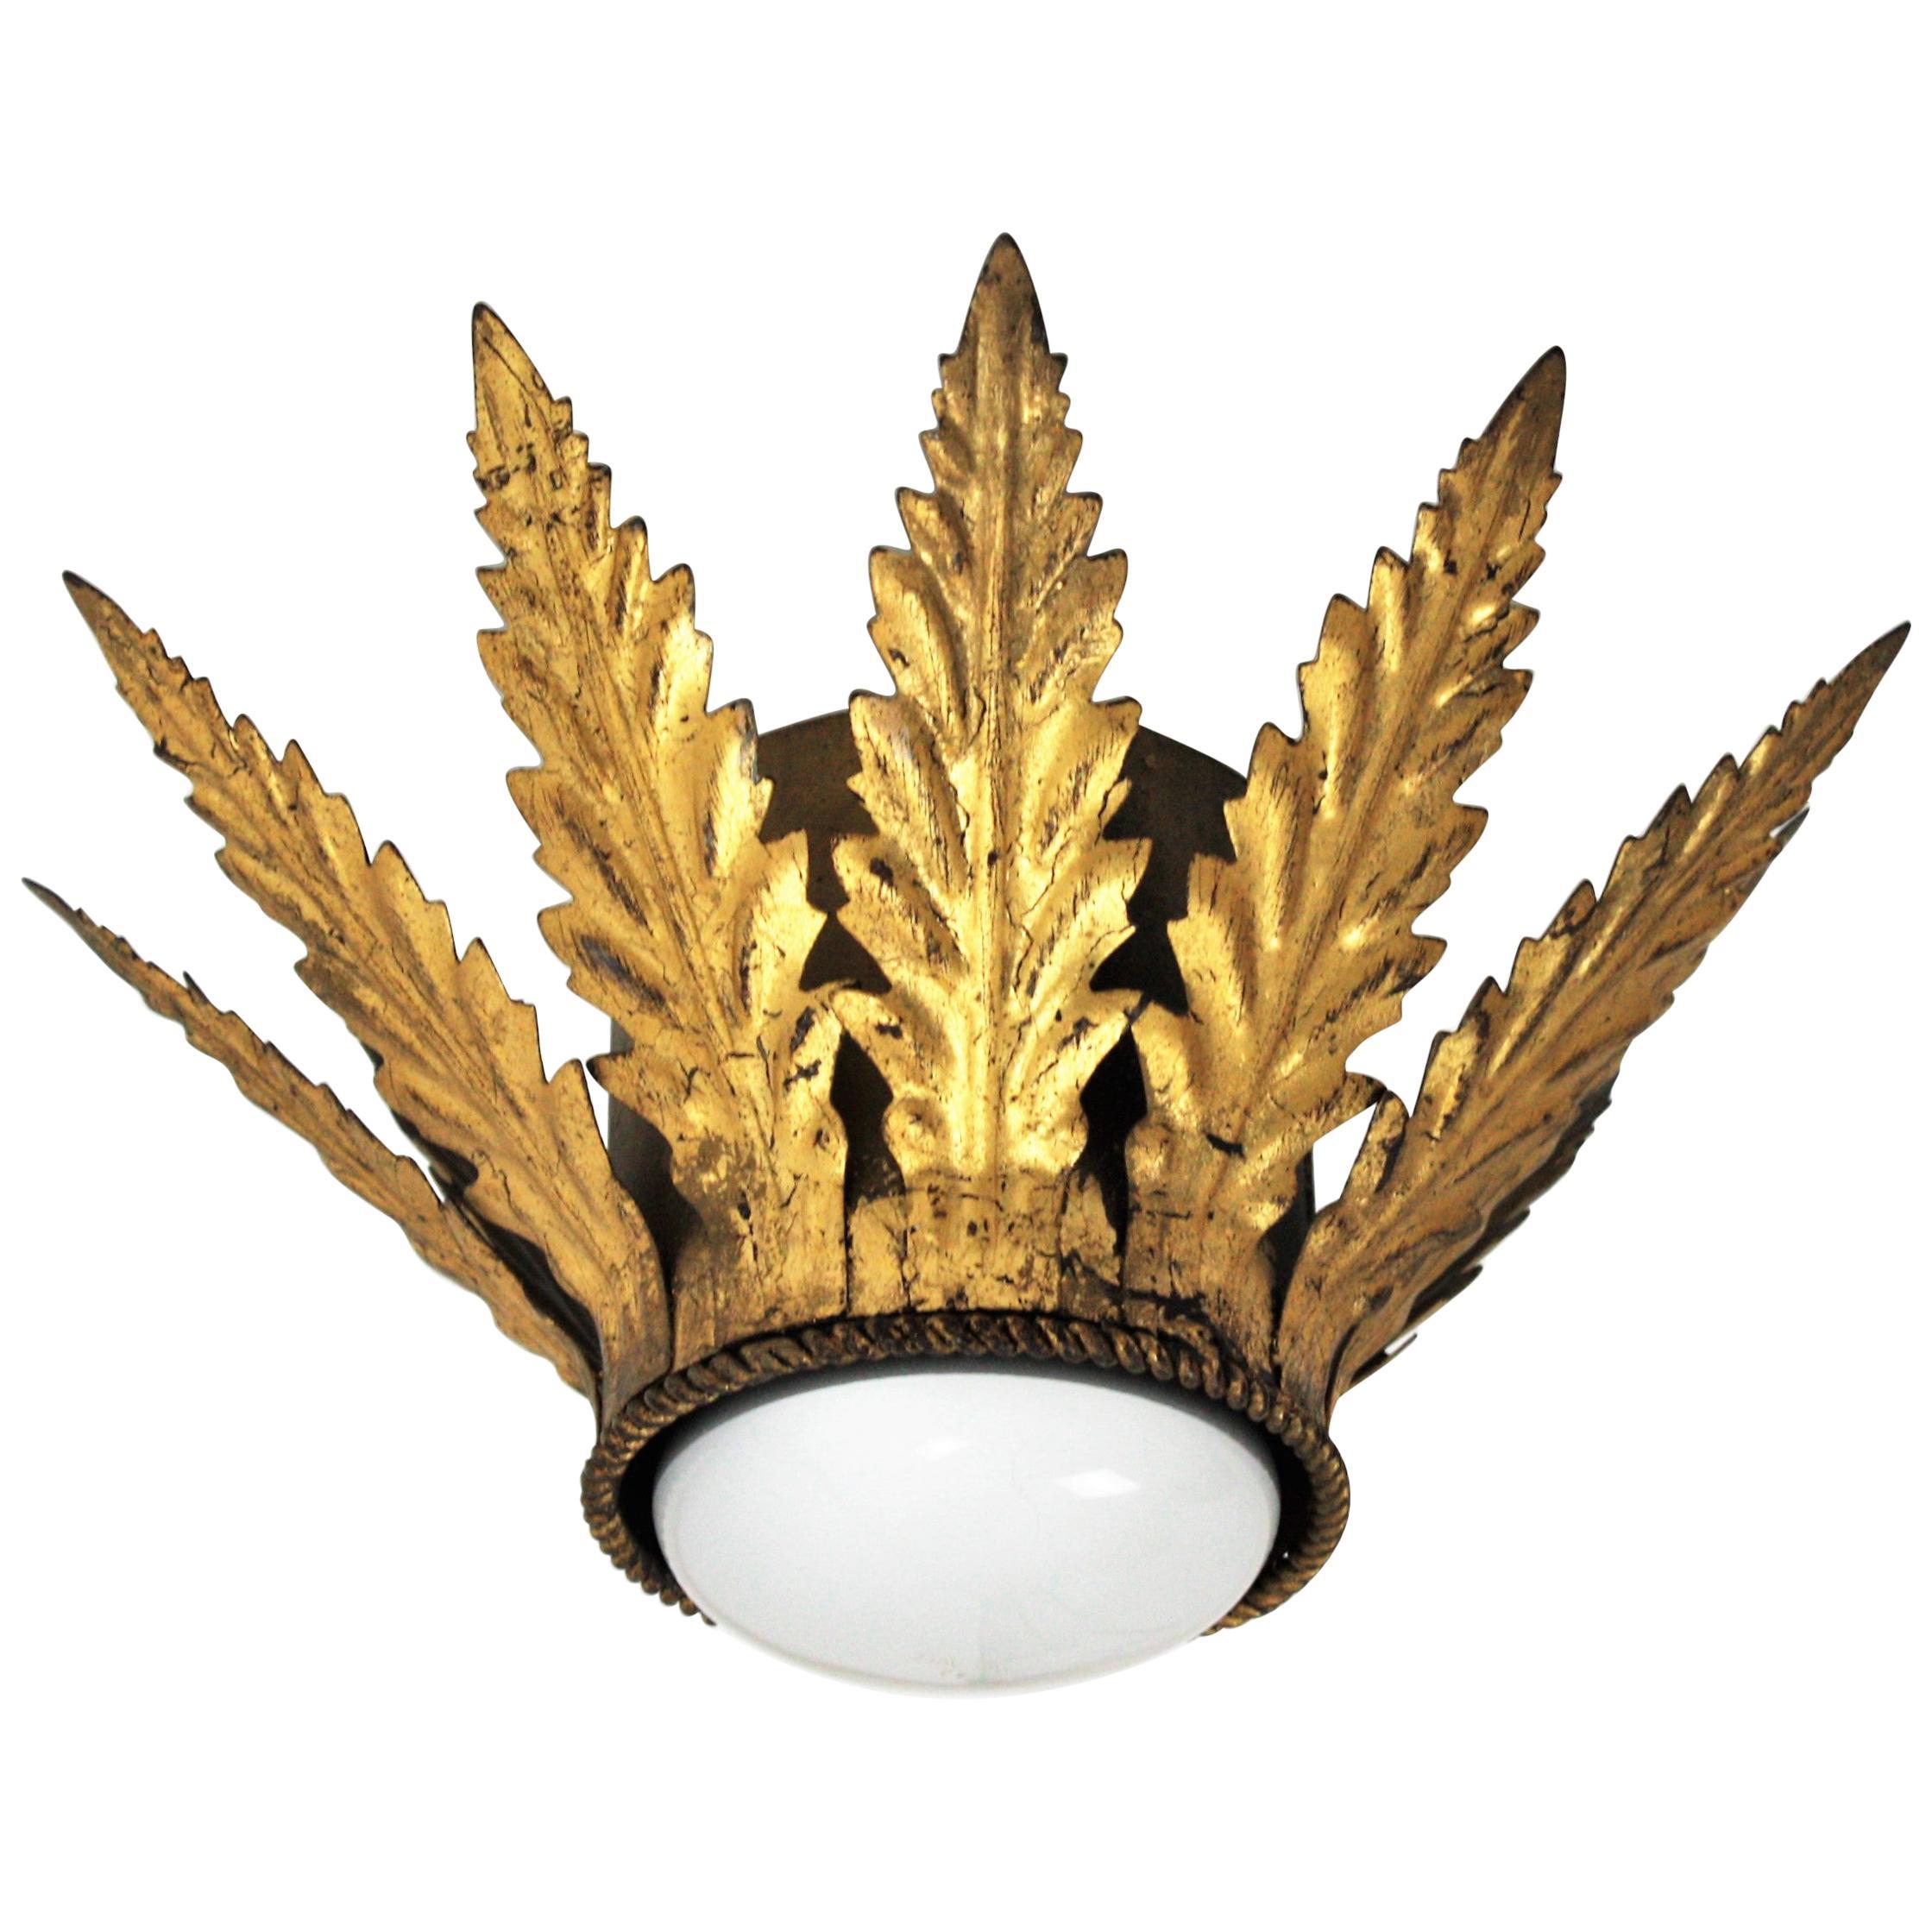 French Sunburst Crown Foliate Flush Mount Light Fixture, 1940s